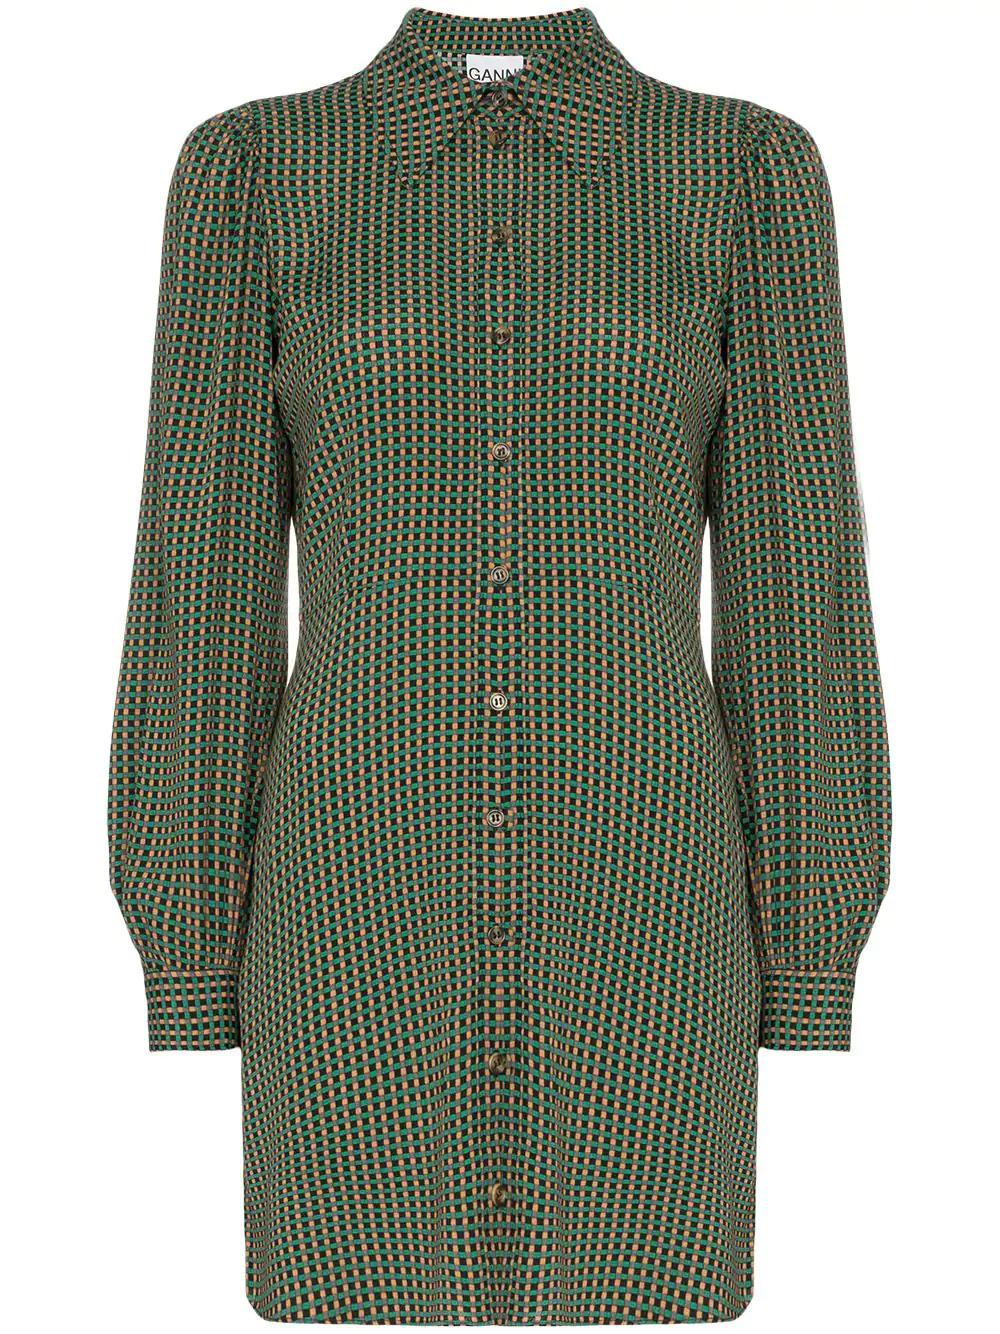 Green Ganni Check Print Shirt Dress |